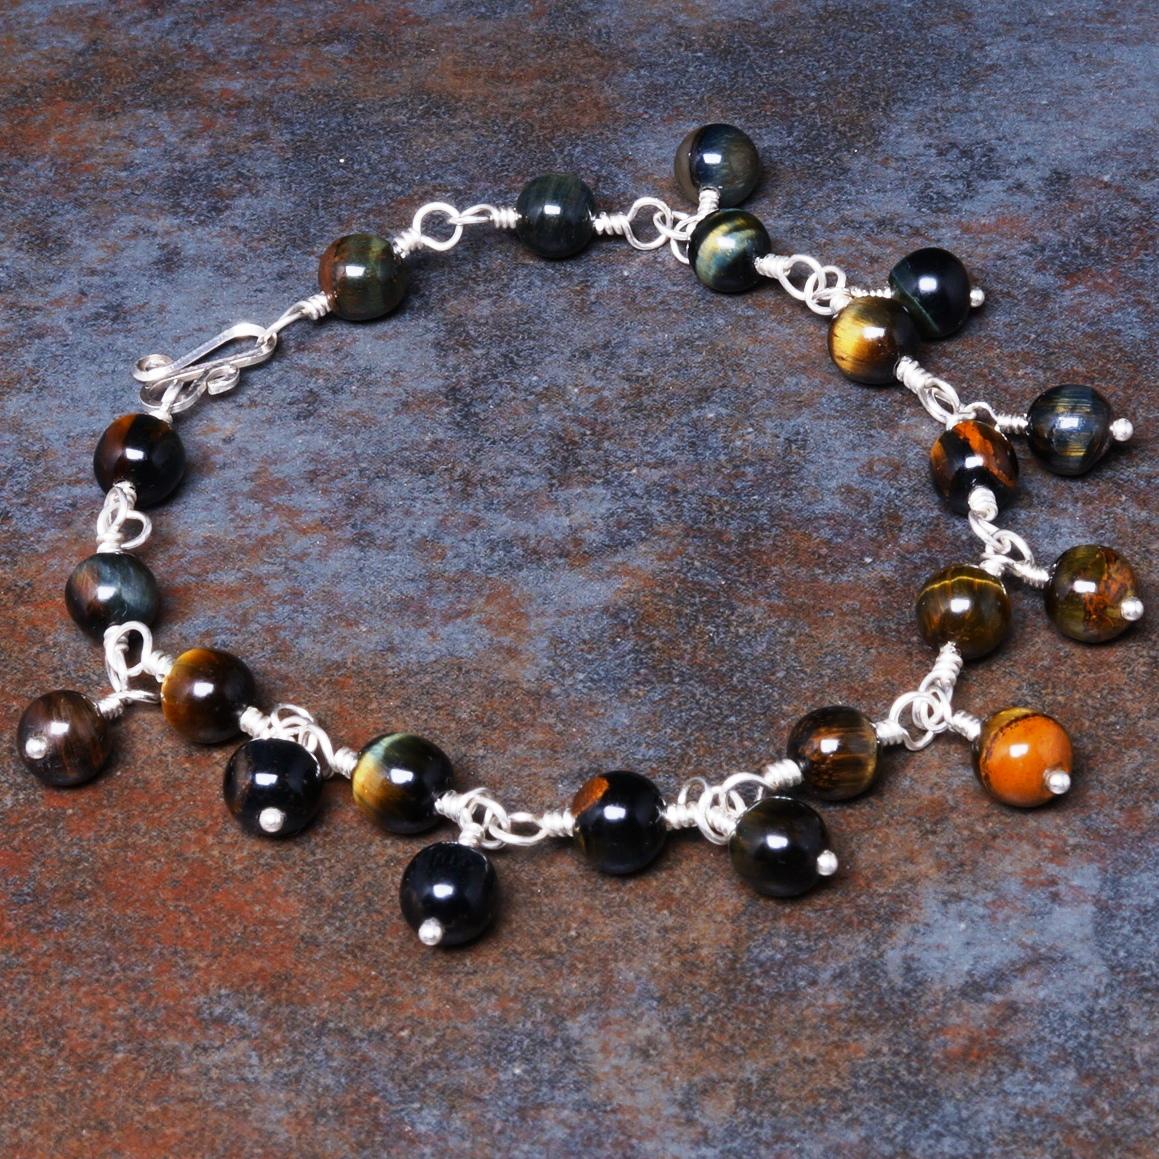 Handmade Sterling Silver Hawks Eye Charm Bracelet